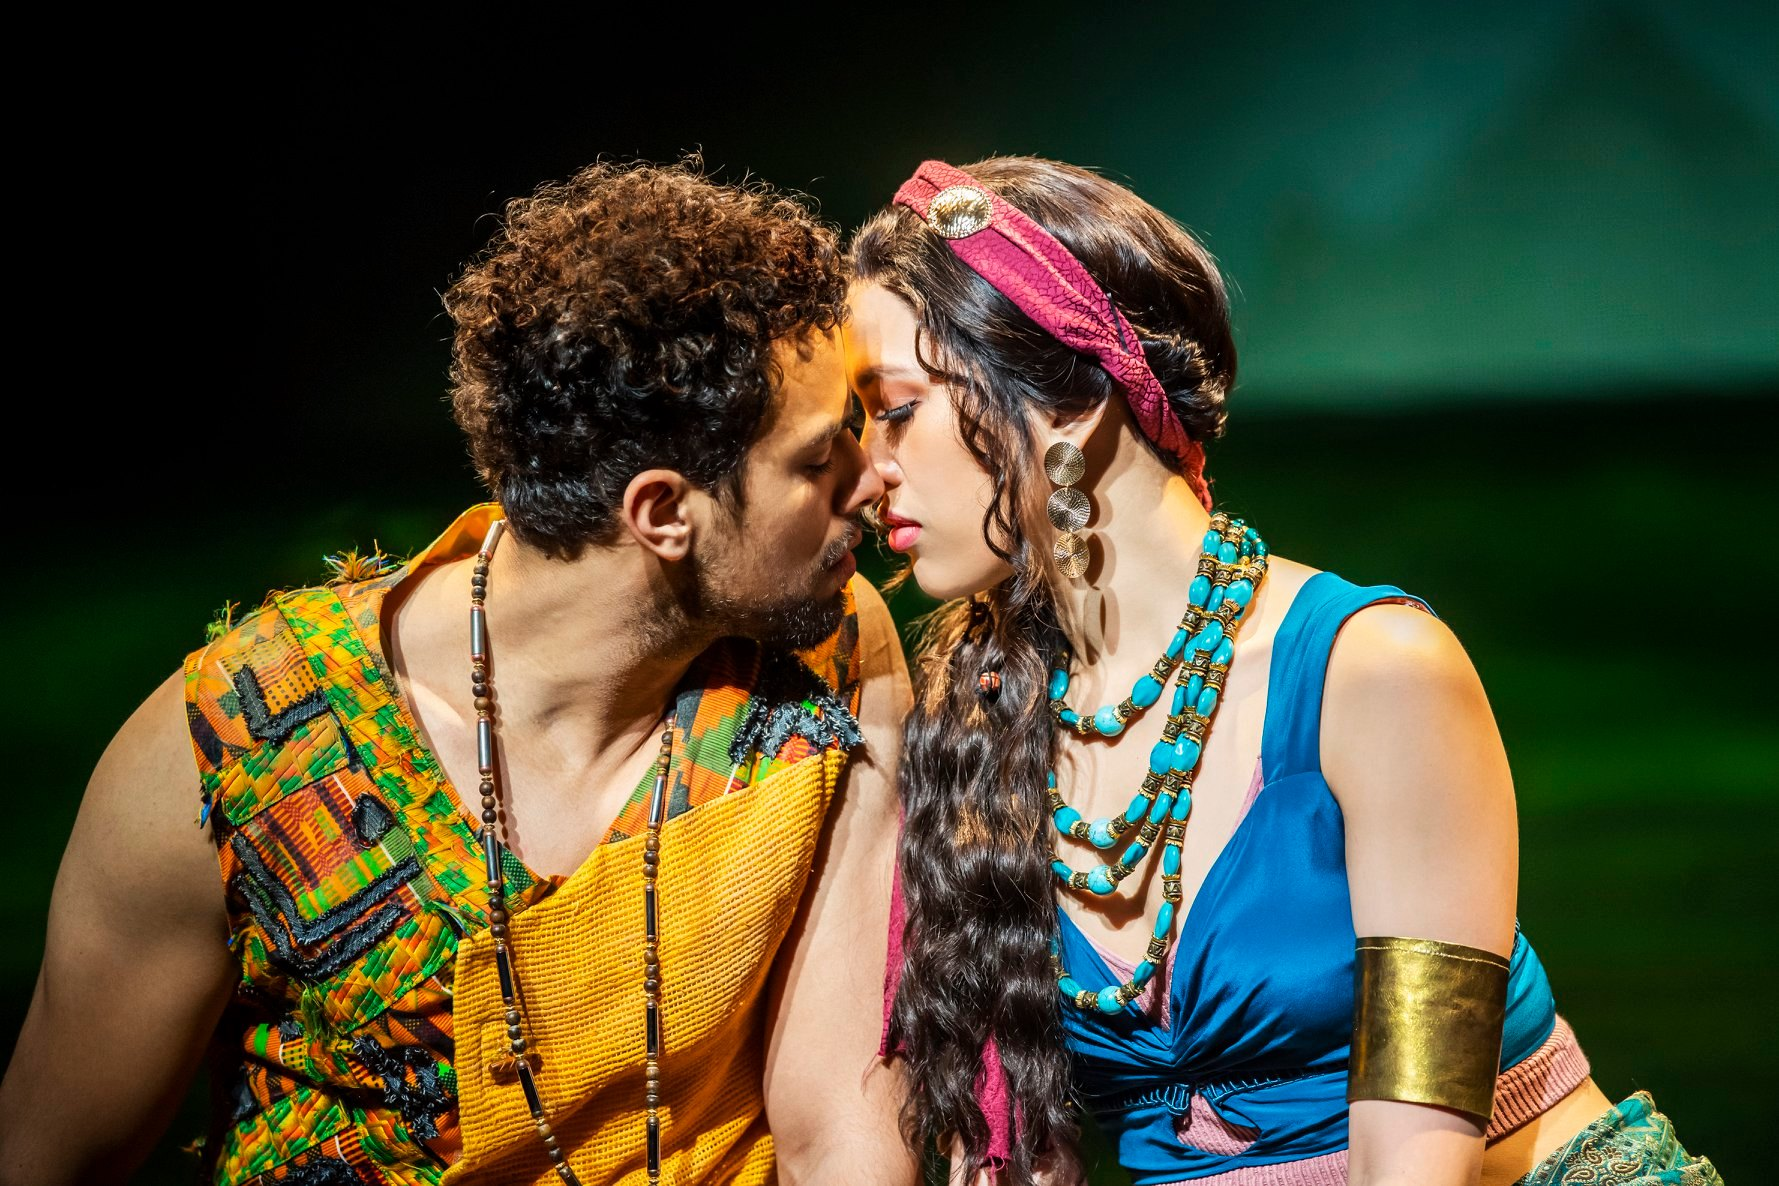 Luke Brady as Moses & Christine Allado as Tzipporah